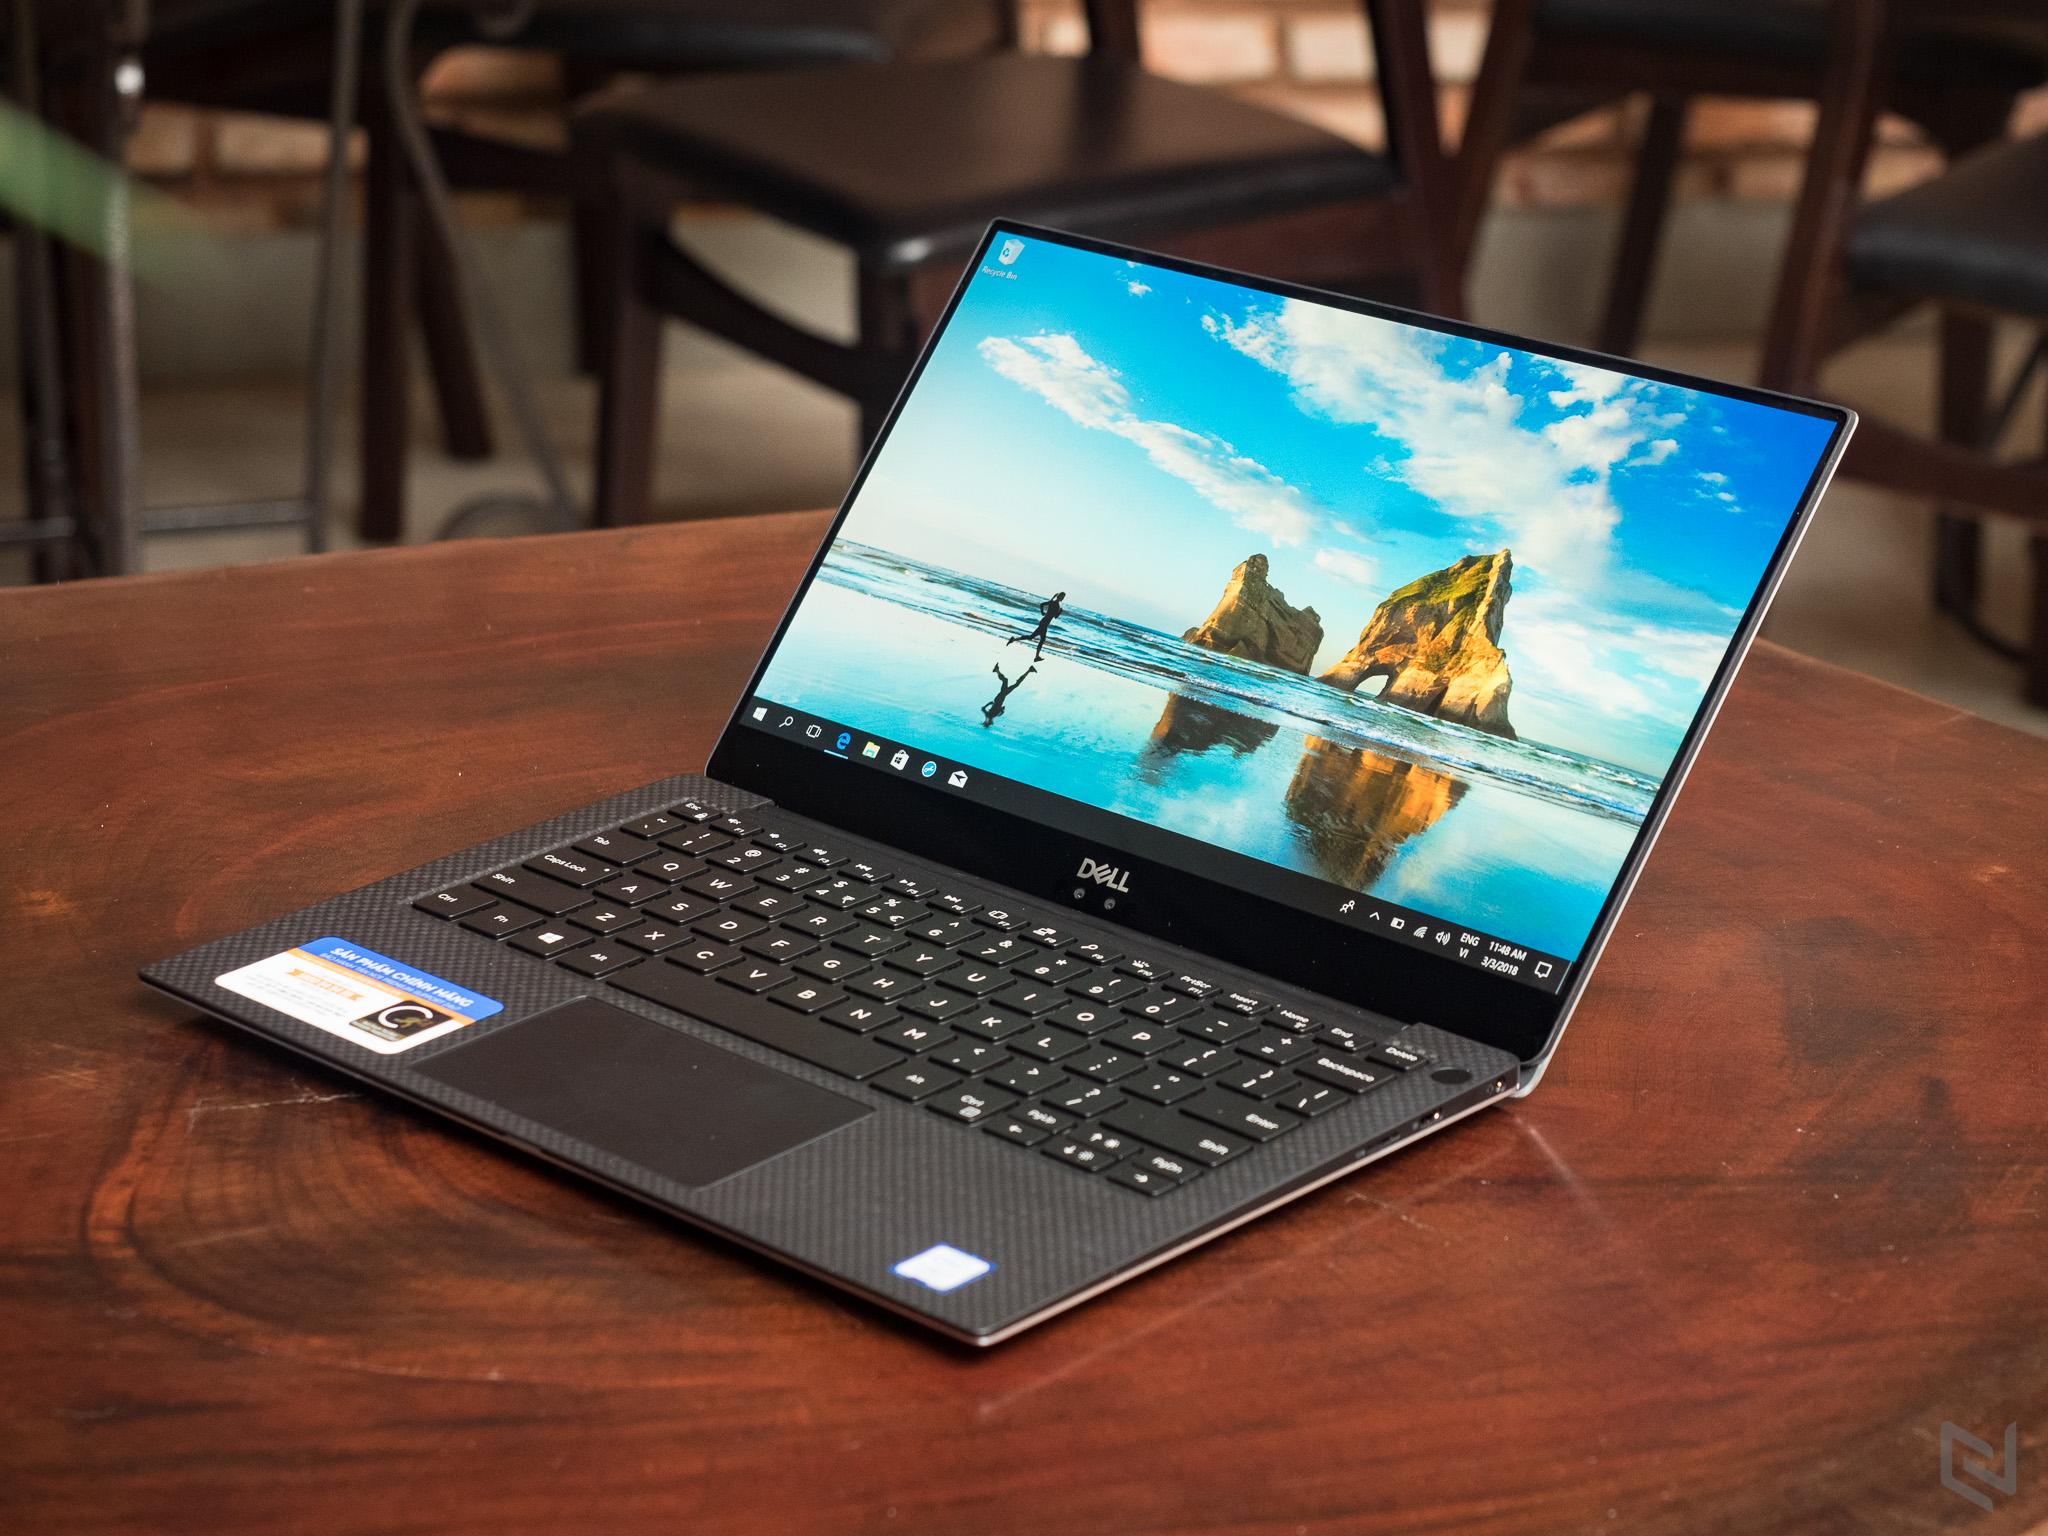 trên tay Dell XPS 13 2018